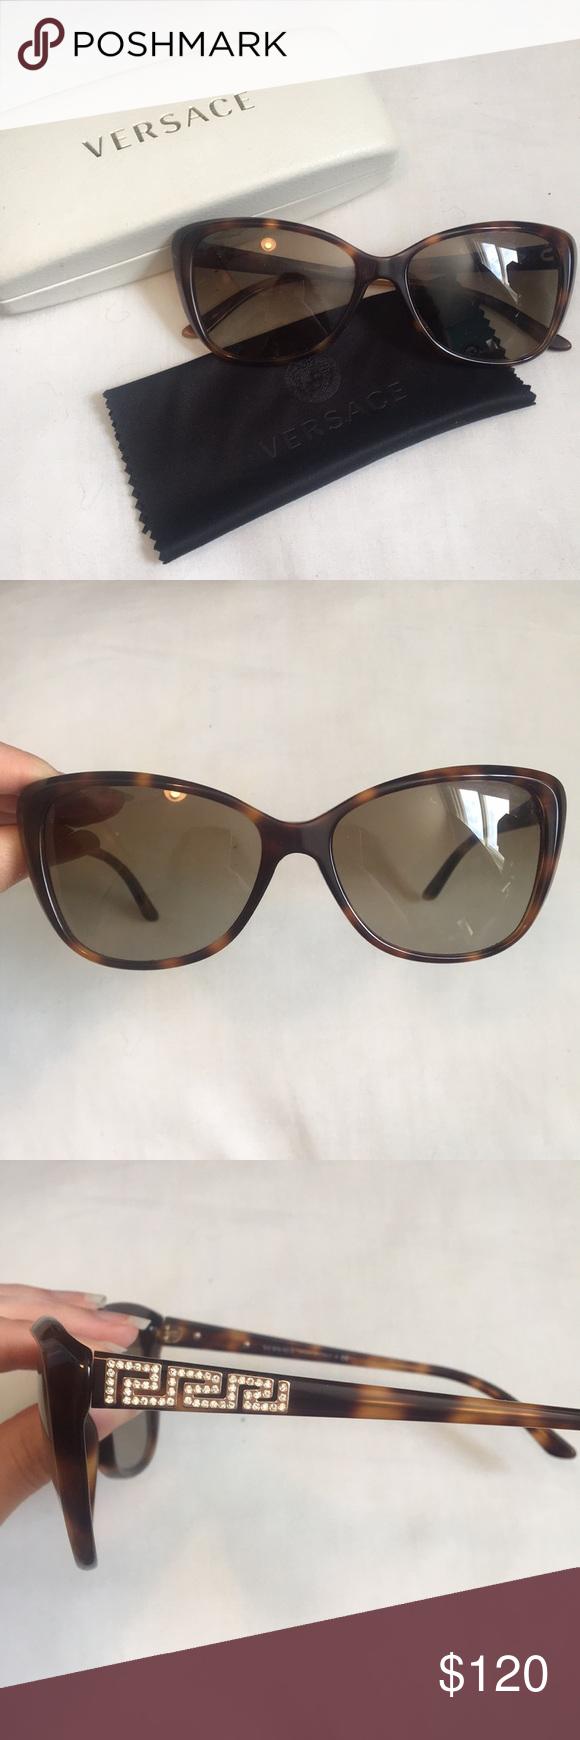 a12c9e6f21 Versace Sunglasses authentic polarized Versace sunglasses (purchased at Sunglass  Hut)